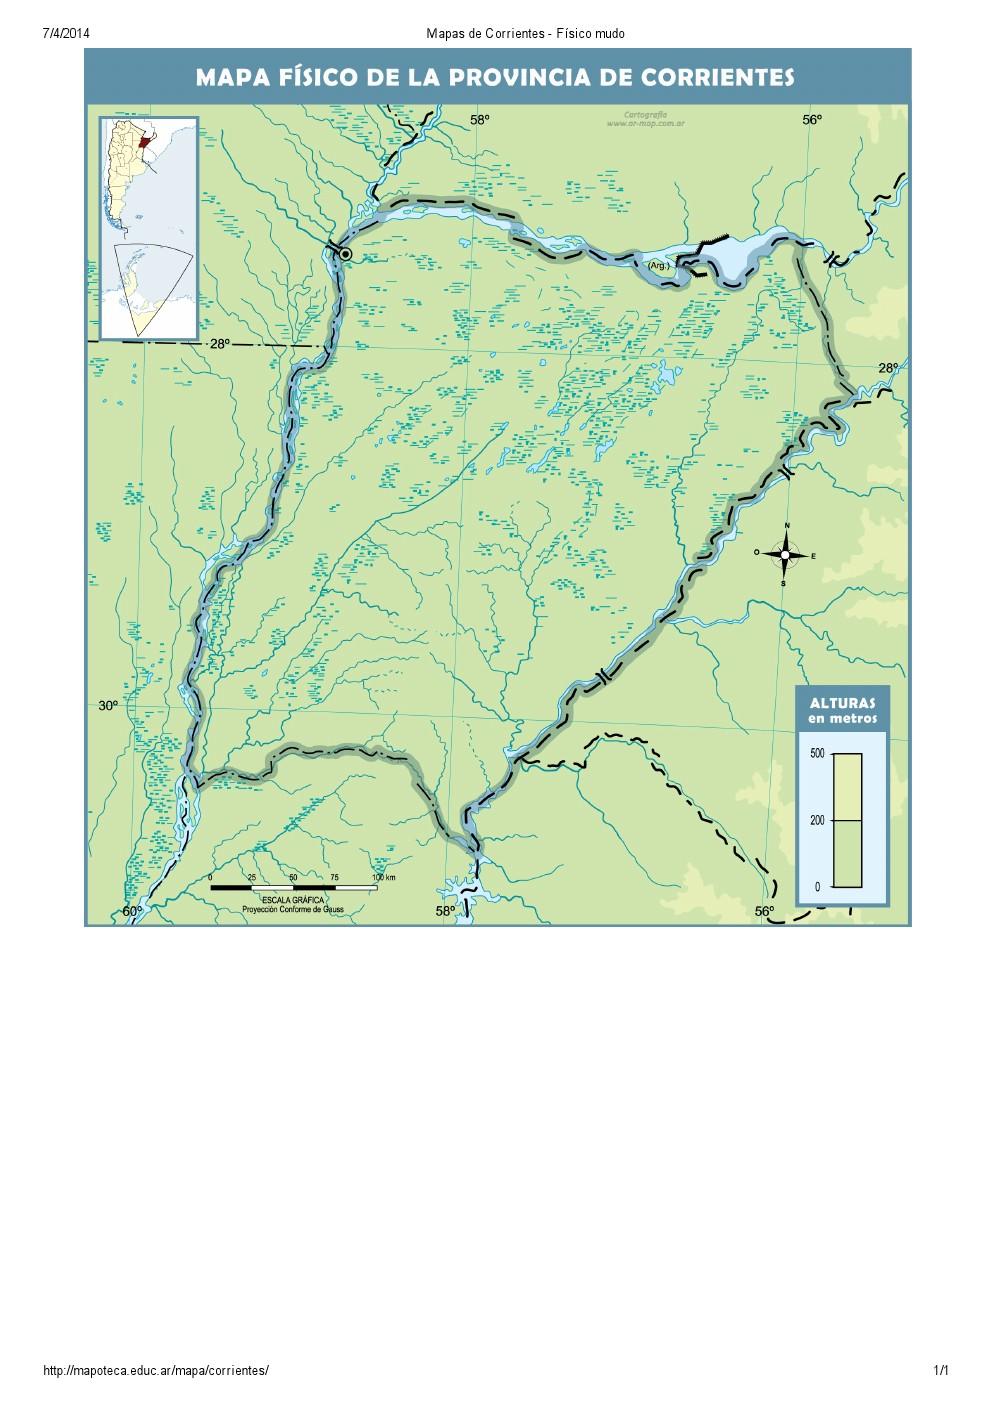 Mapa mudo de ríos de Corrientes. Mapoteca de Educ.ar